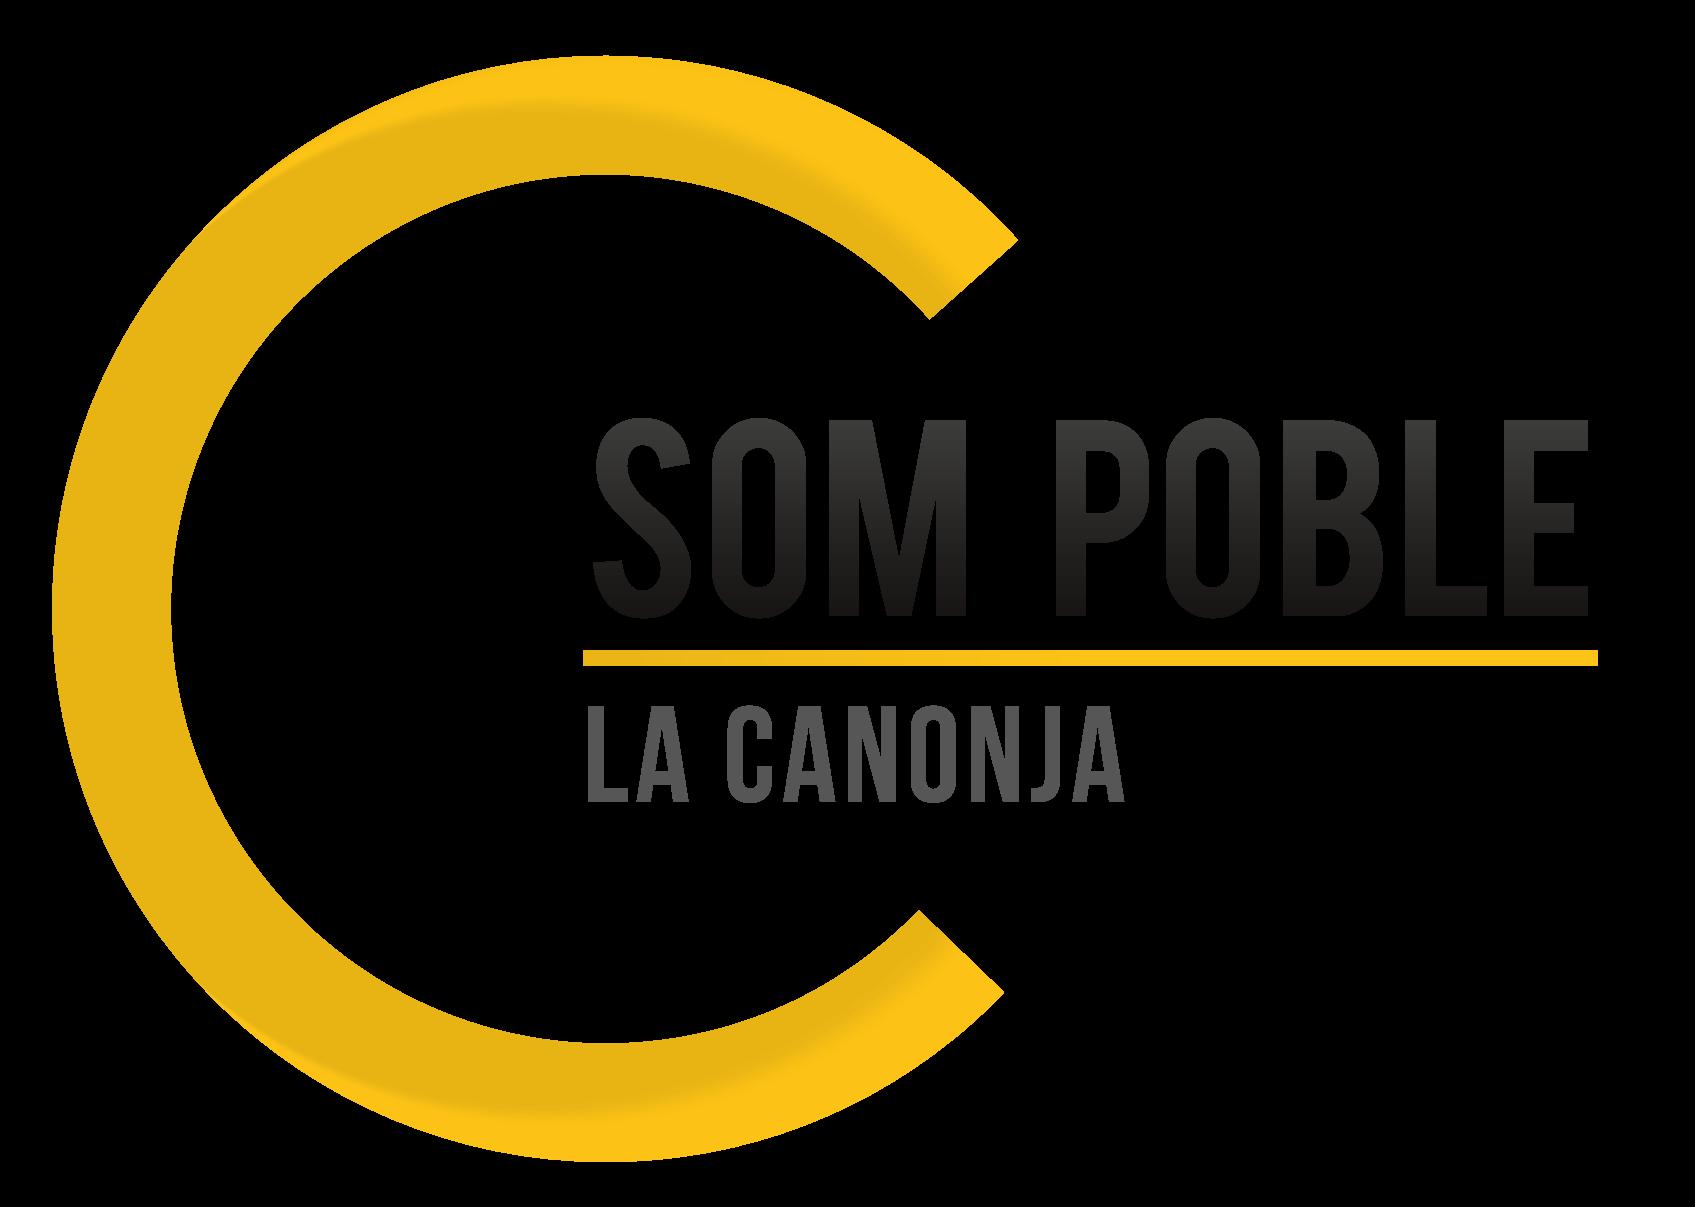 Som Poble – La Canonja